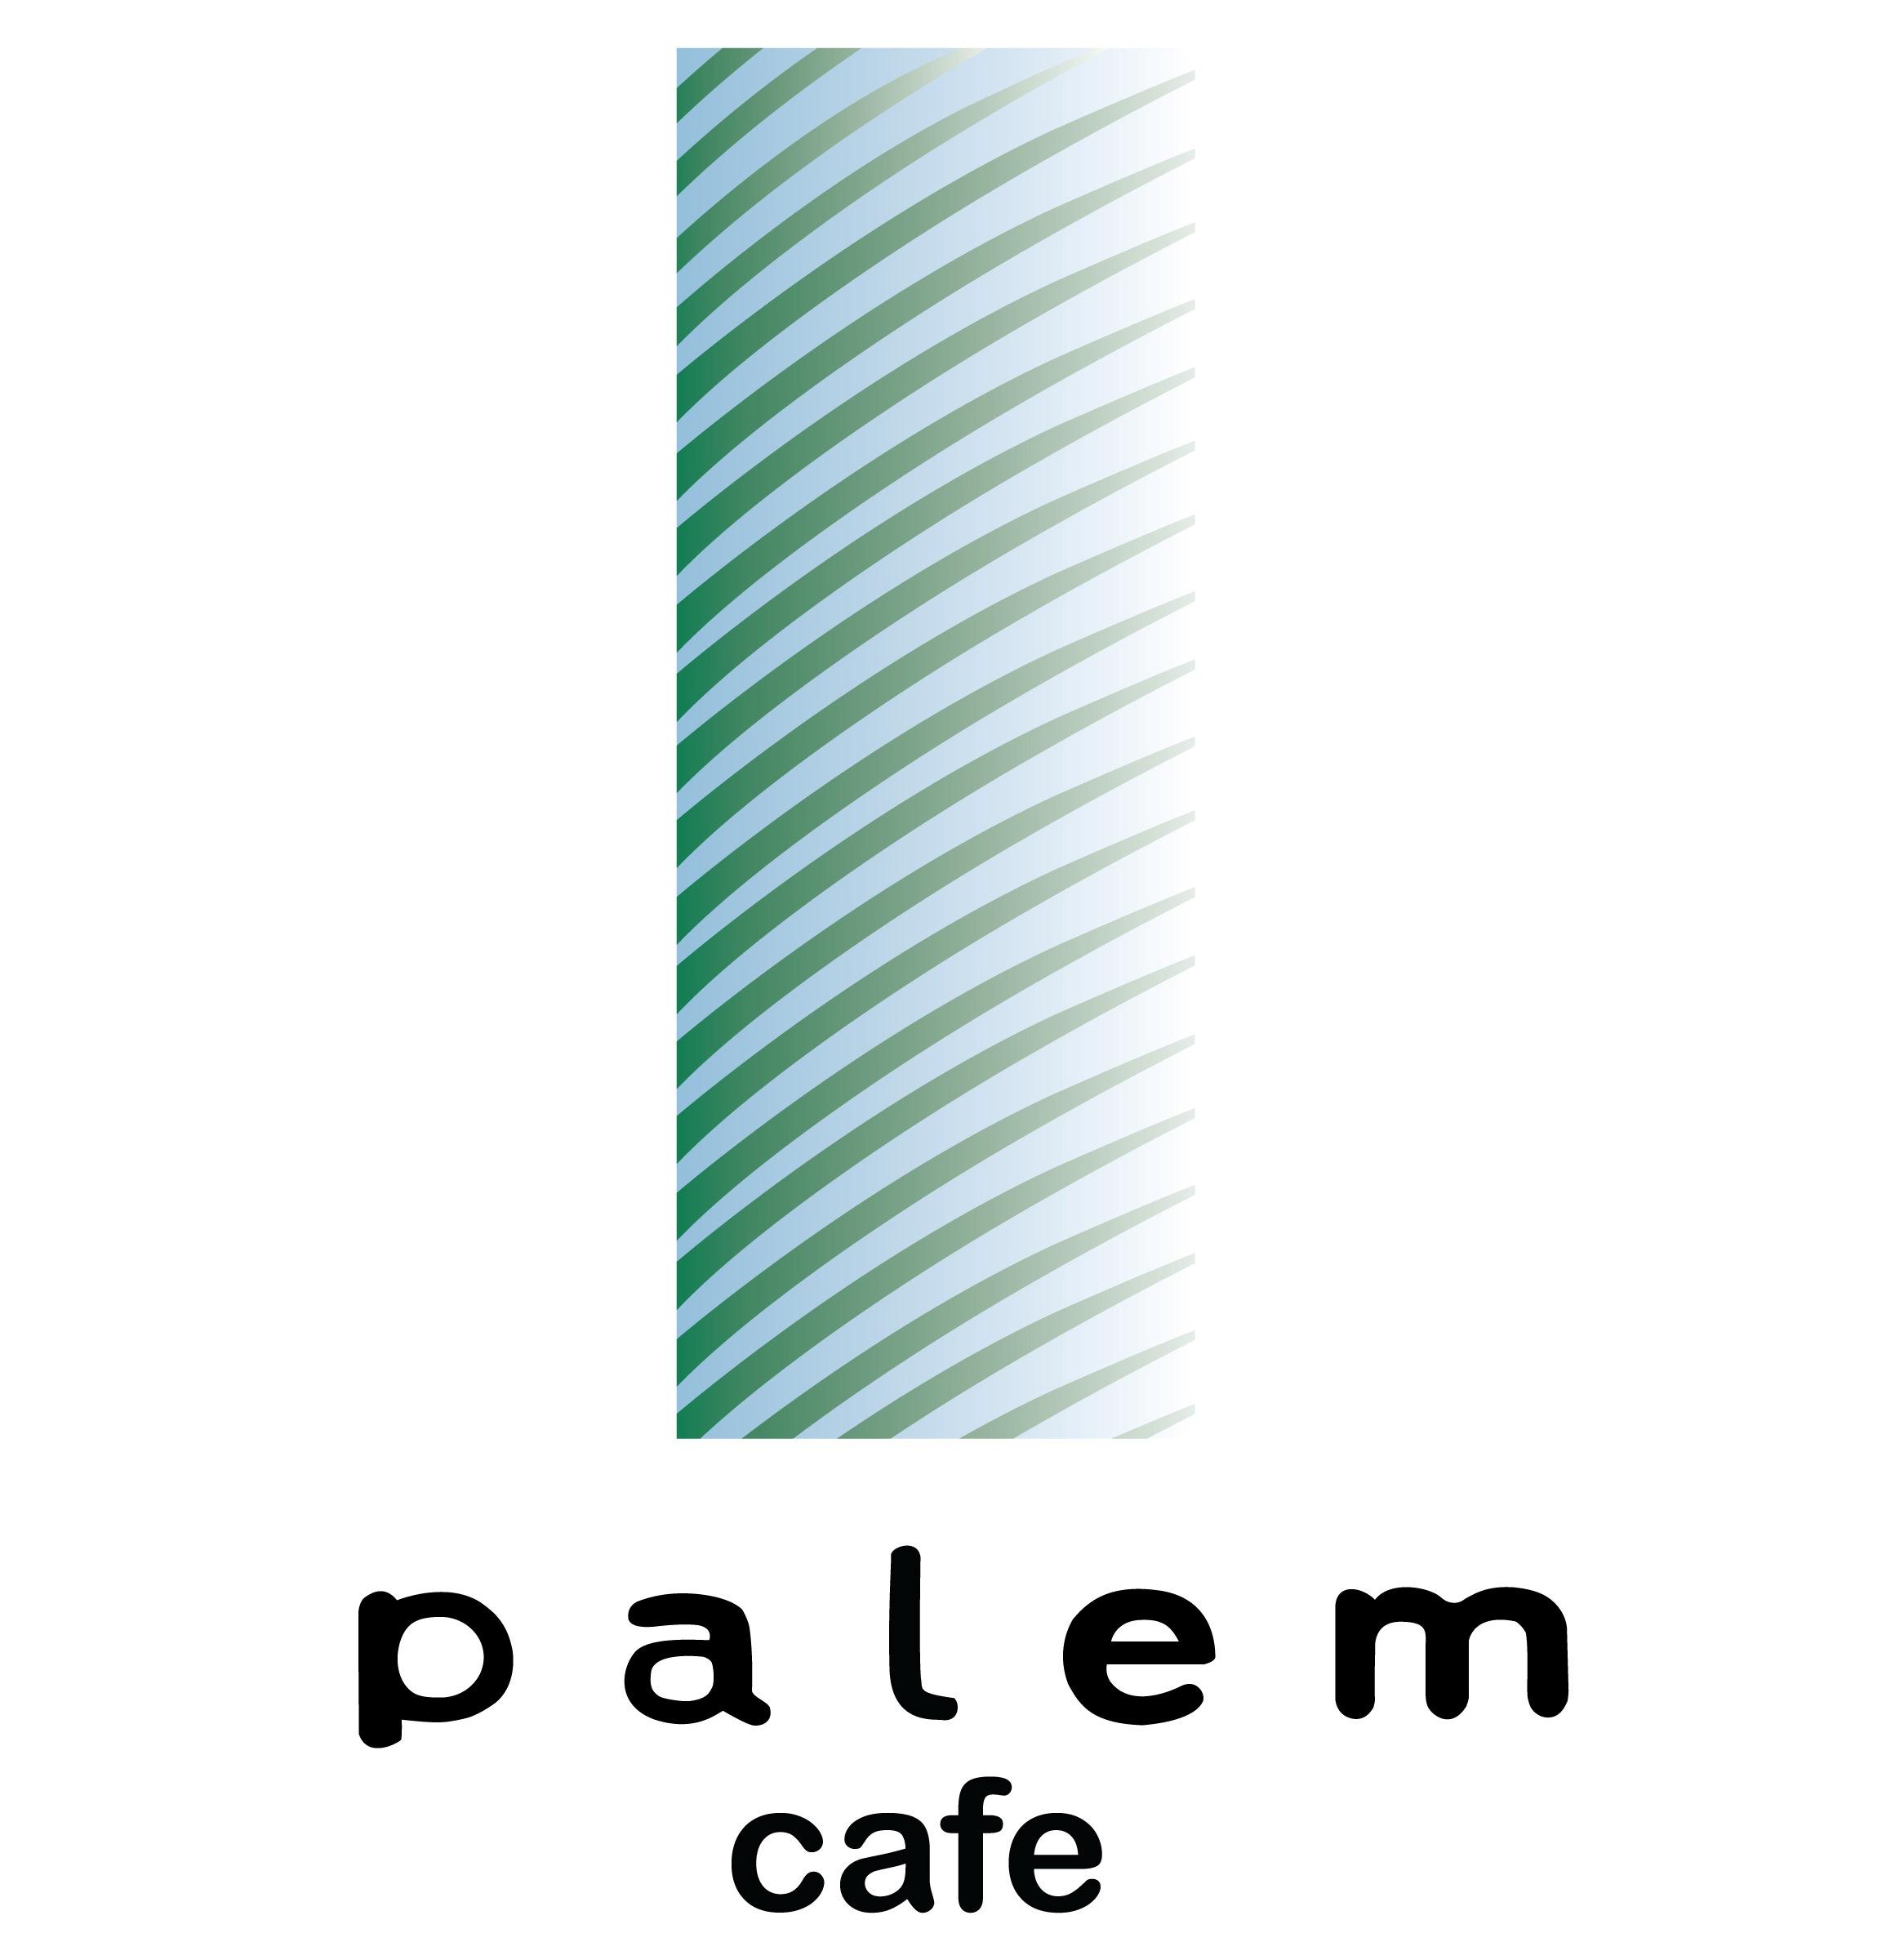 1615246030_20130527014508_Logo palem cafeHires